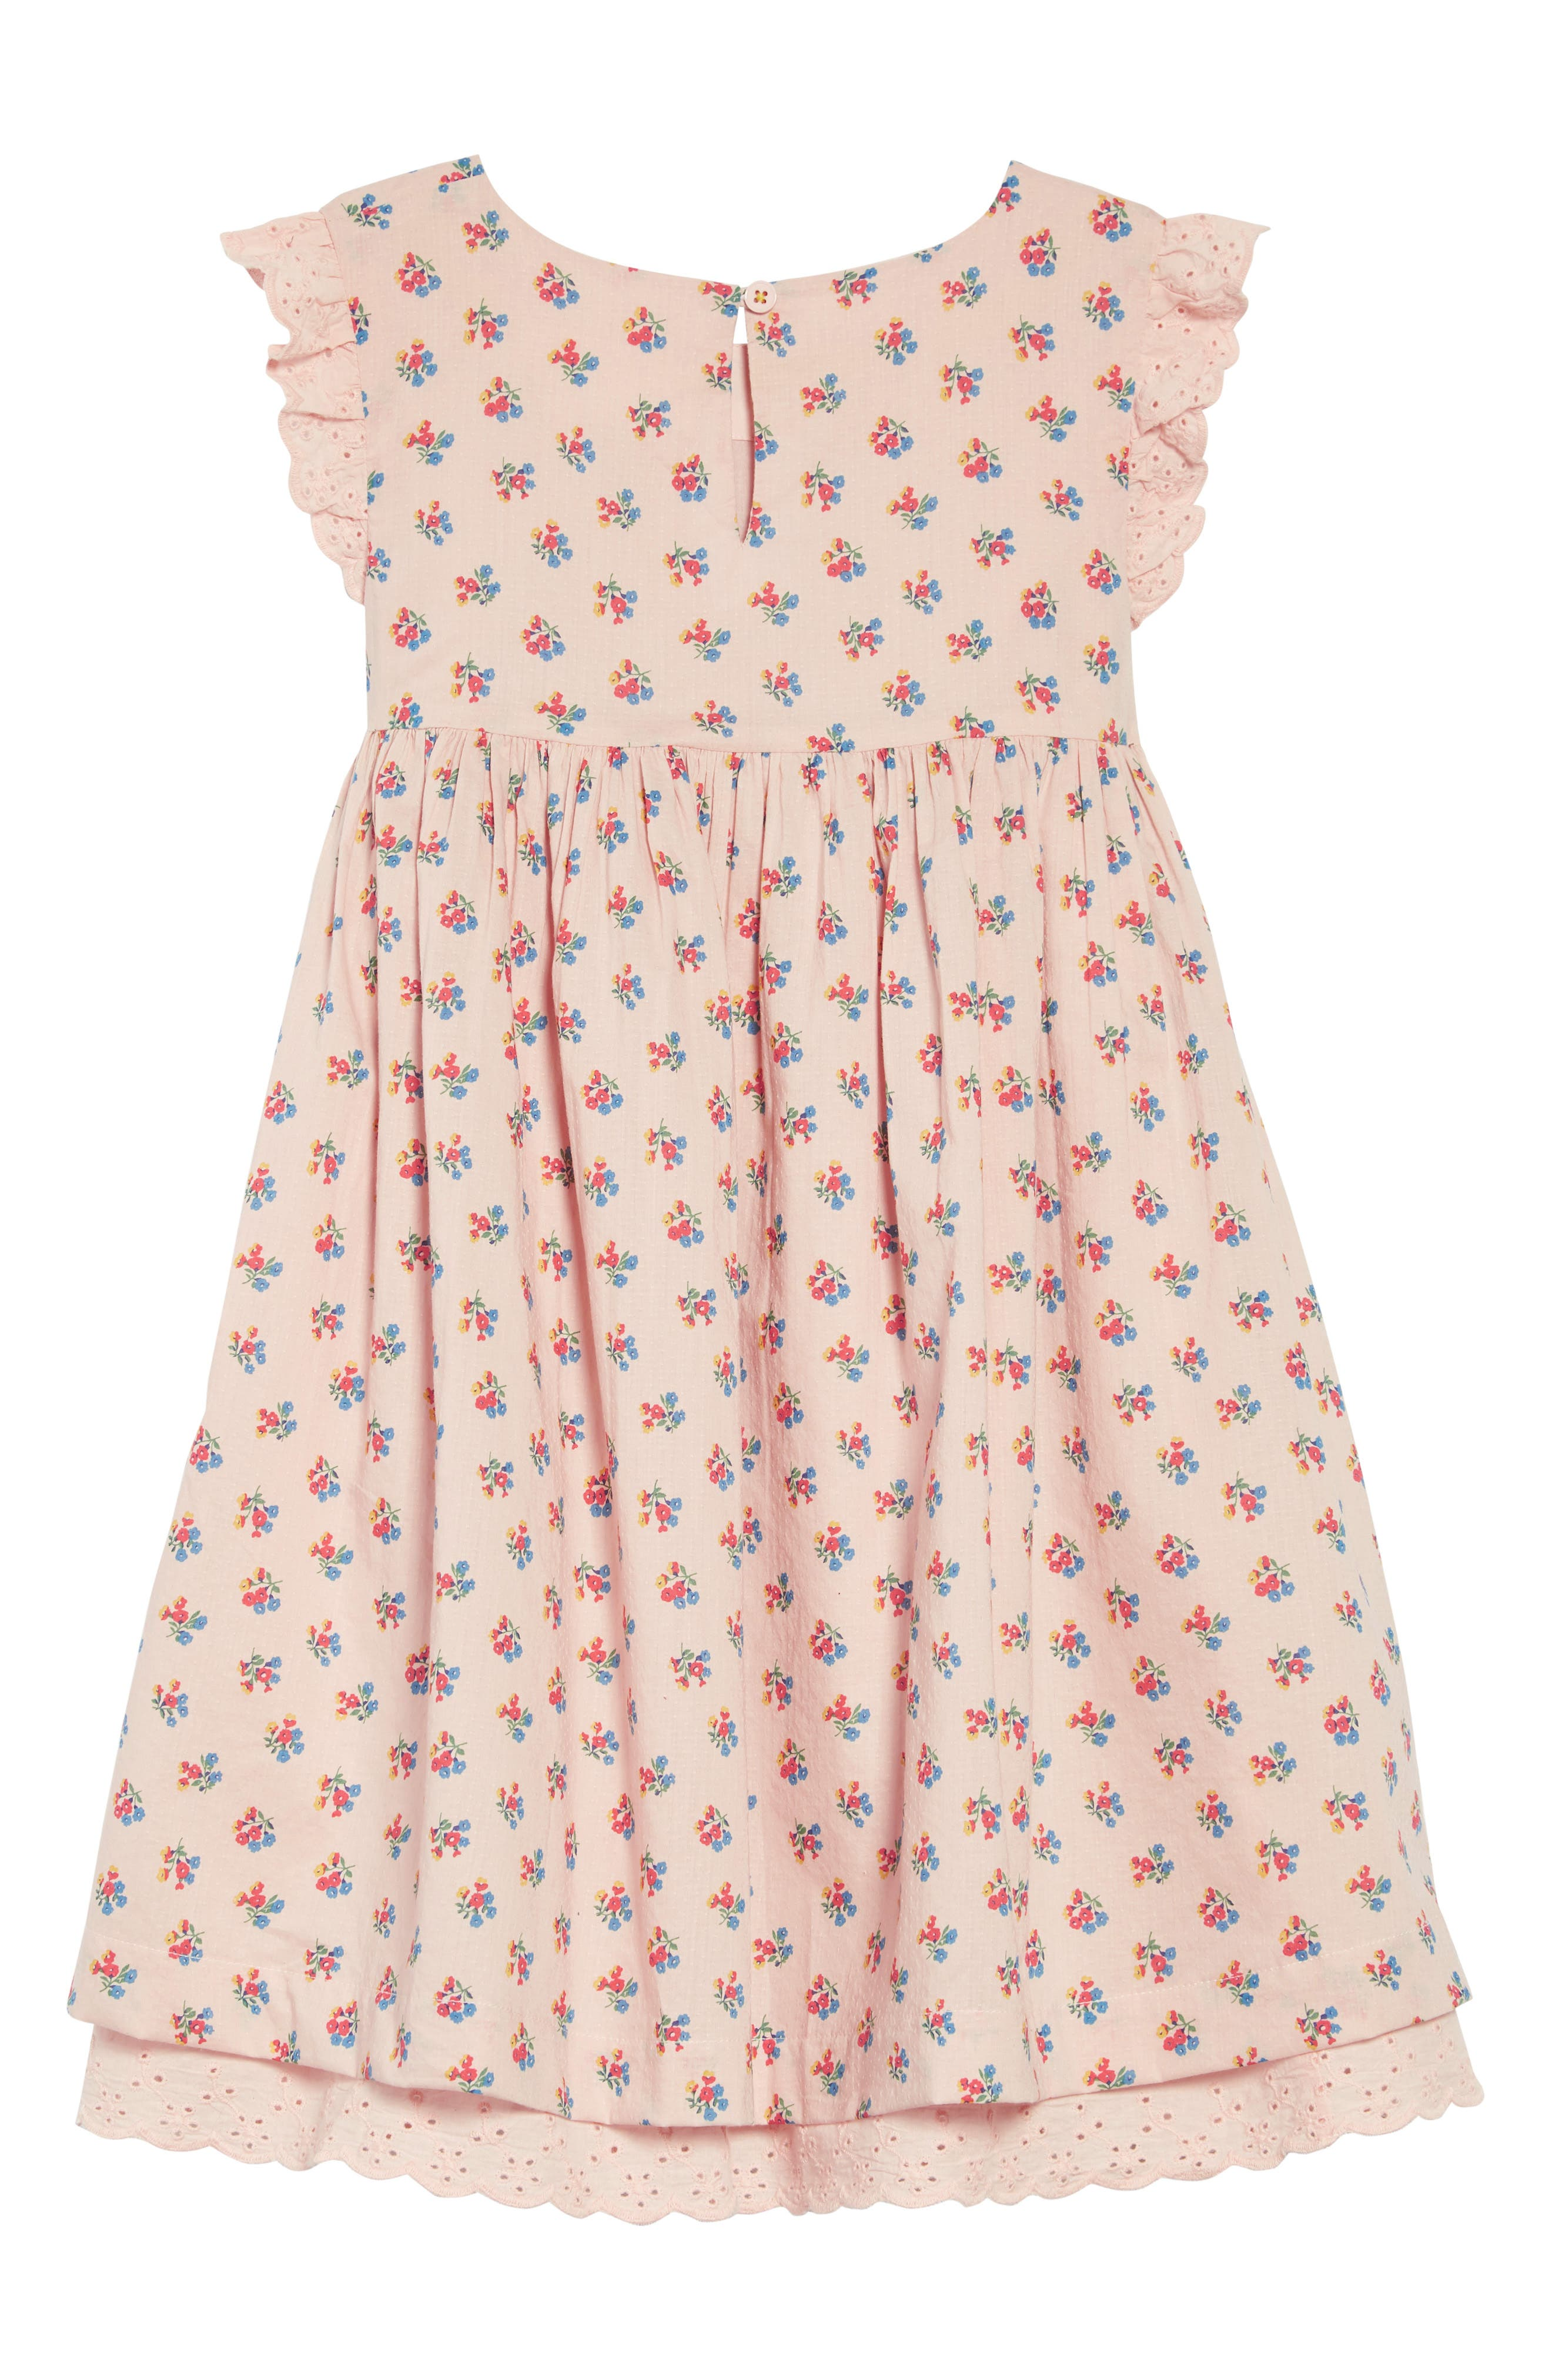 695538eb0 Mini Boden Kids  Clothing